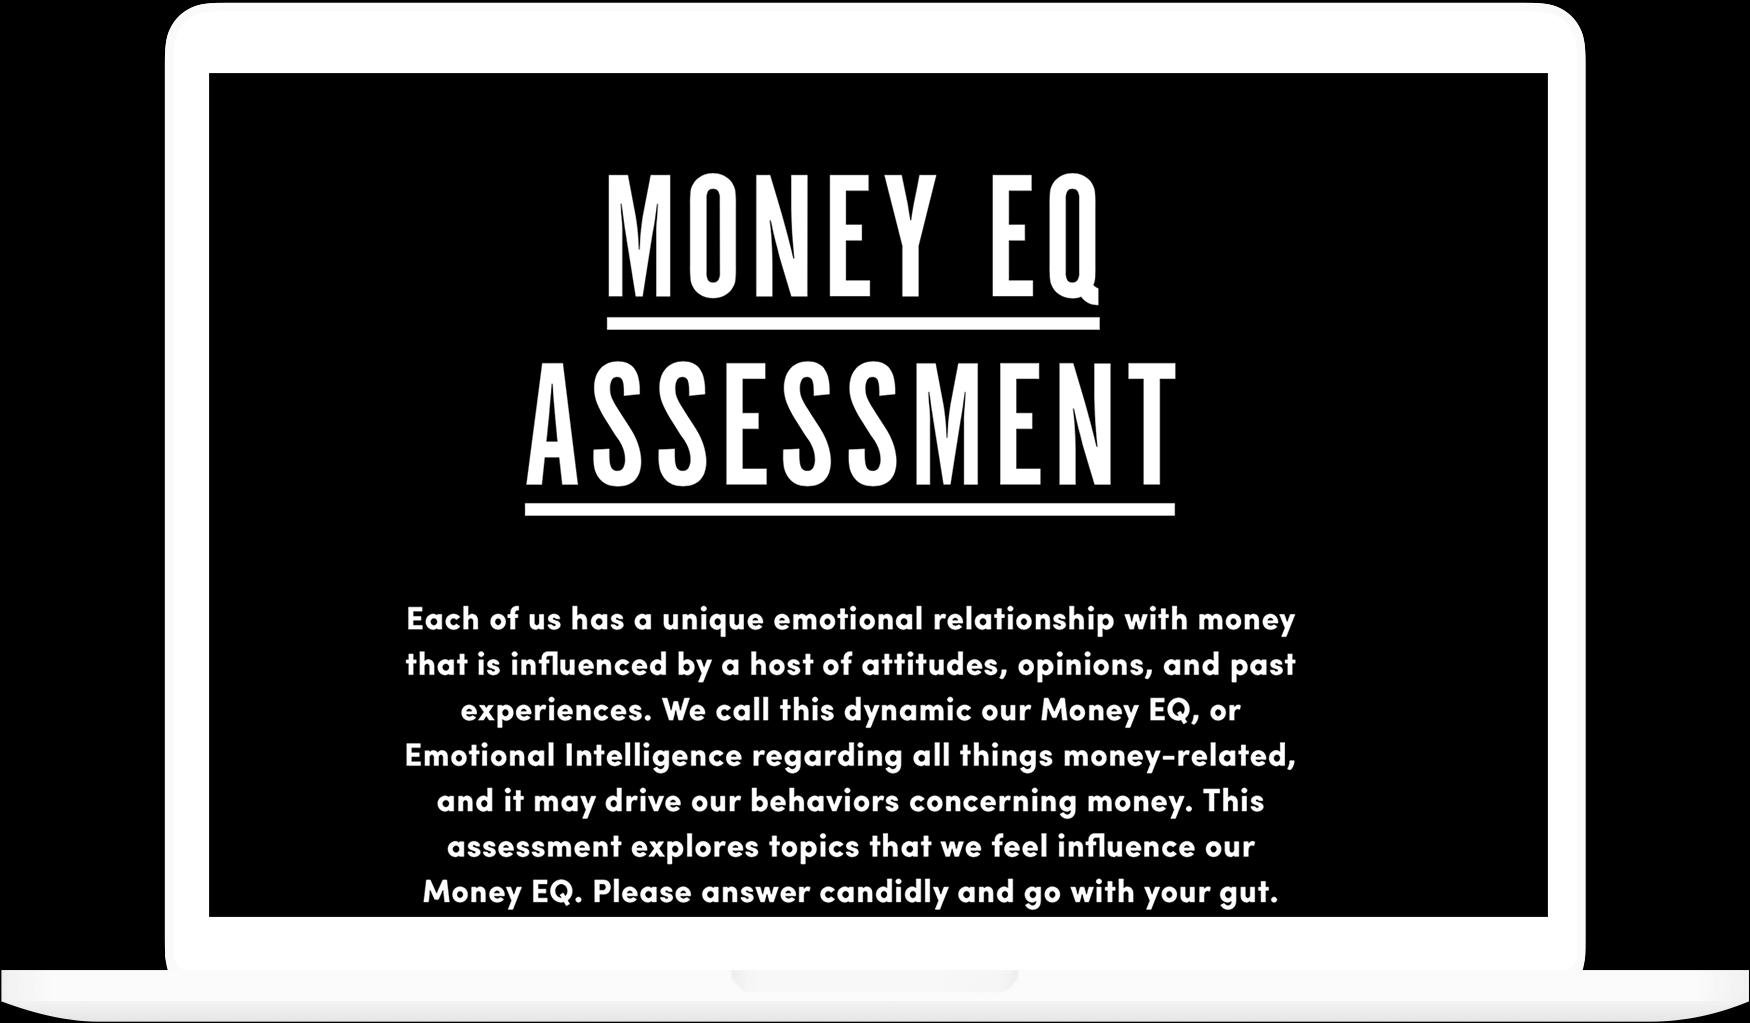 MONEY EQ ASSESSMENT